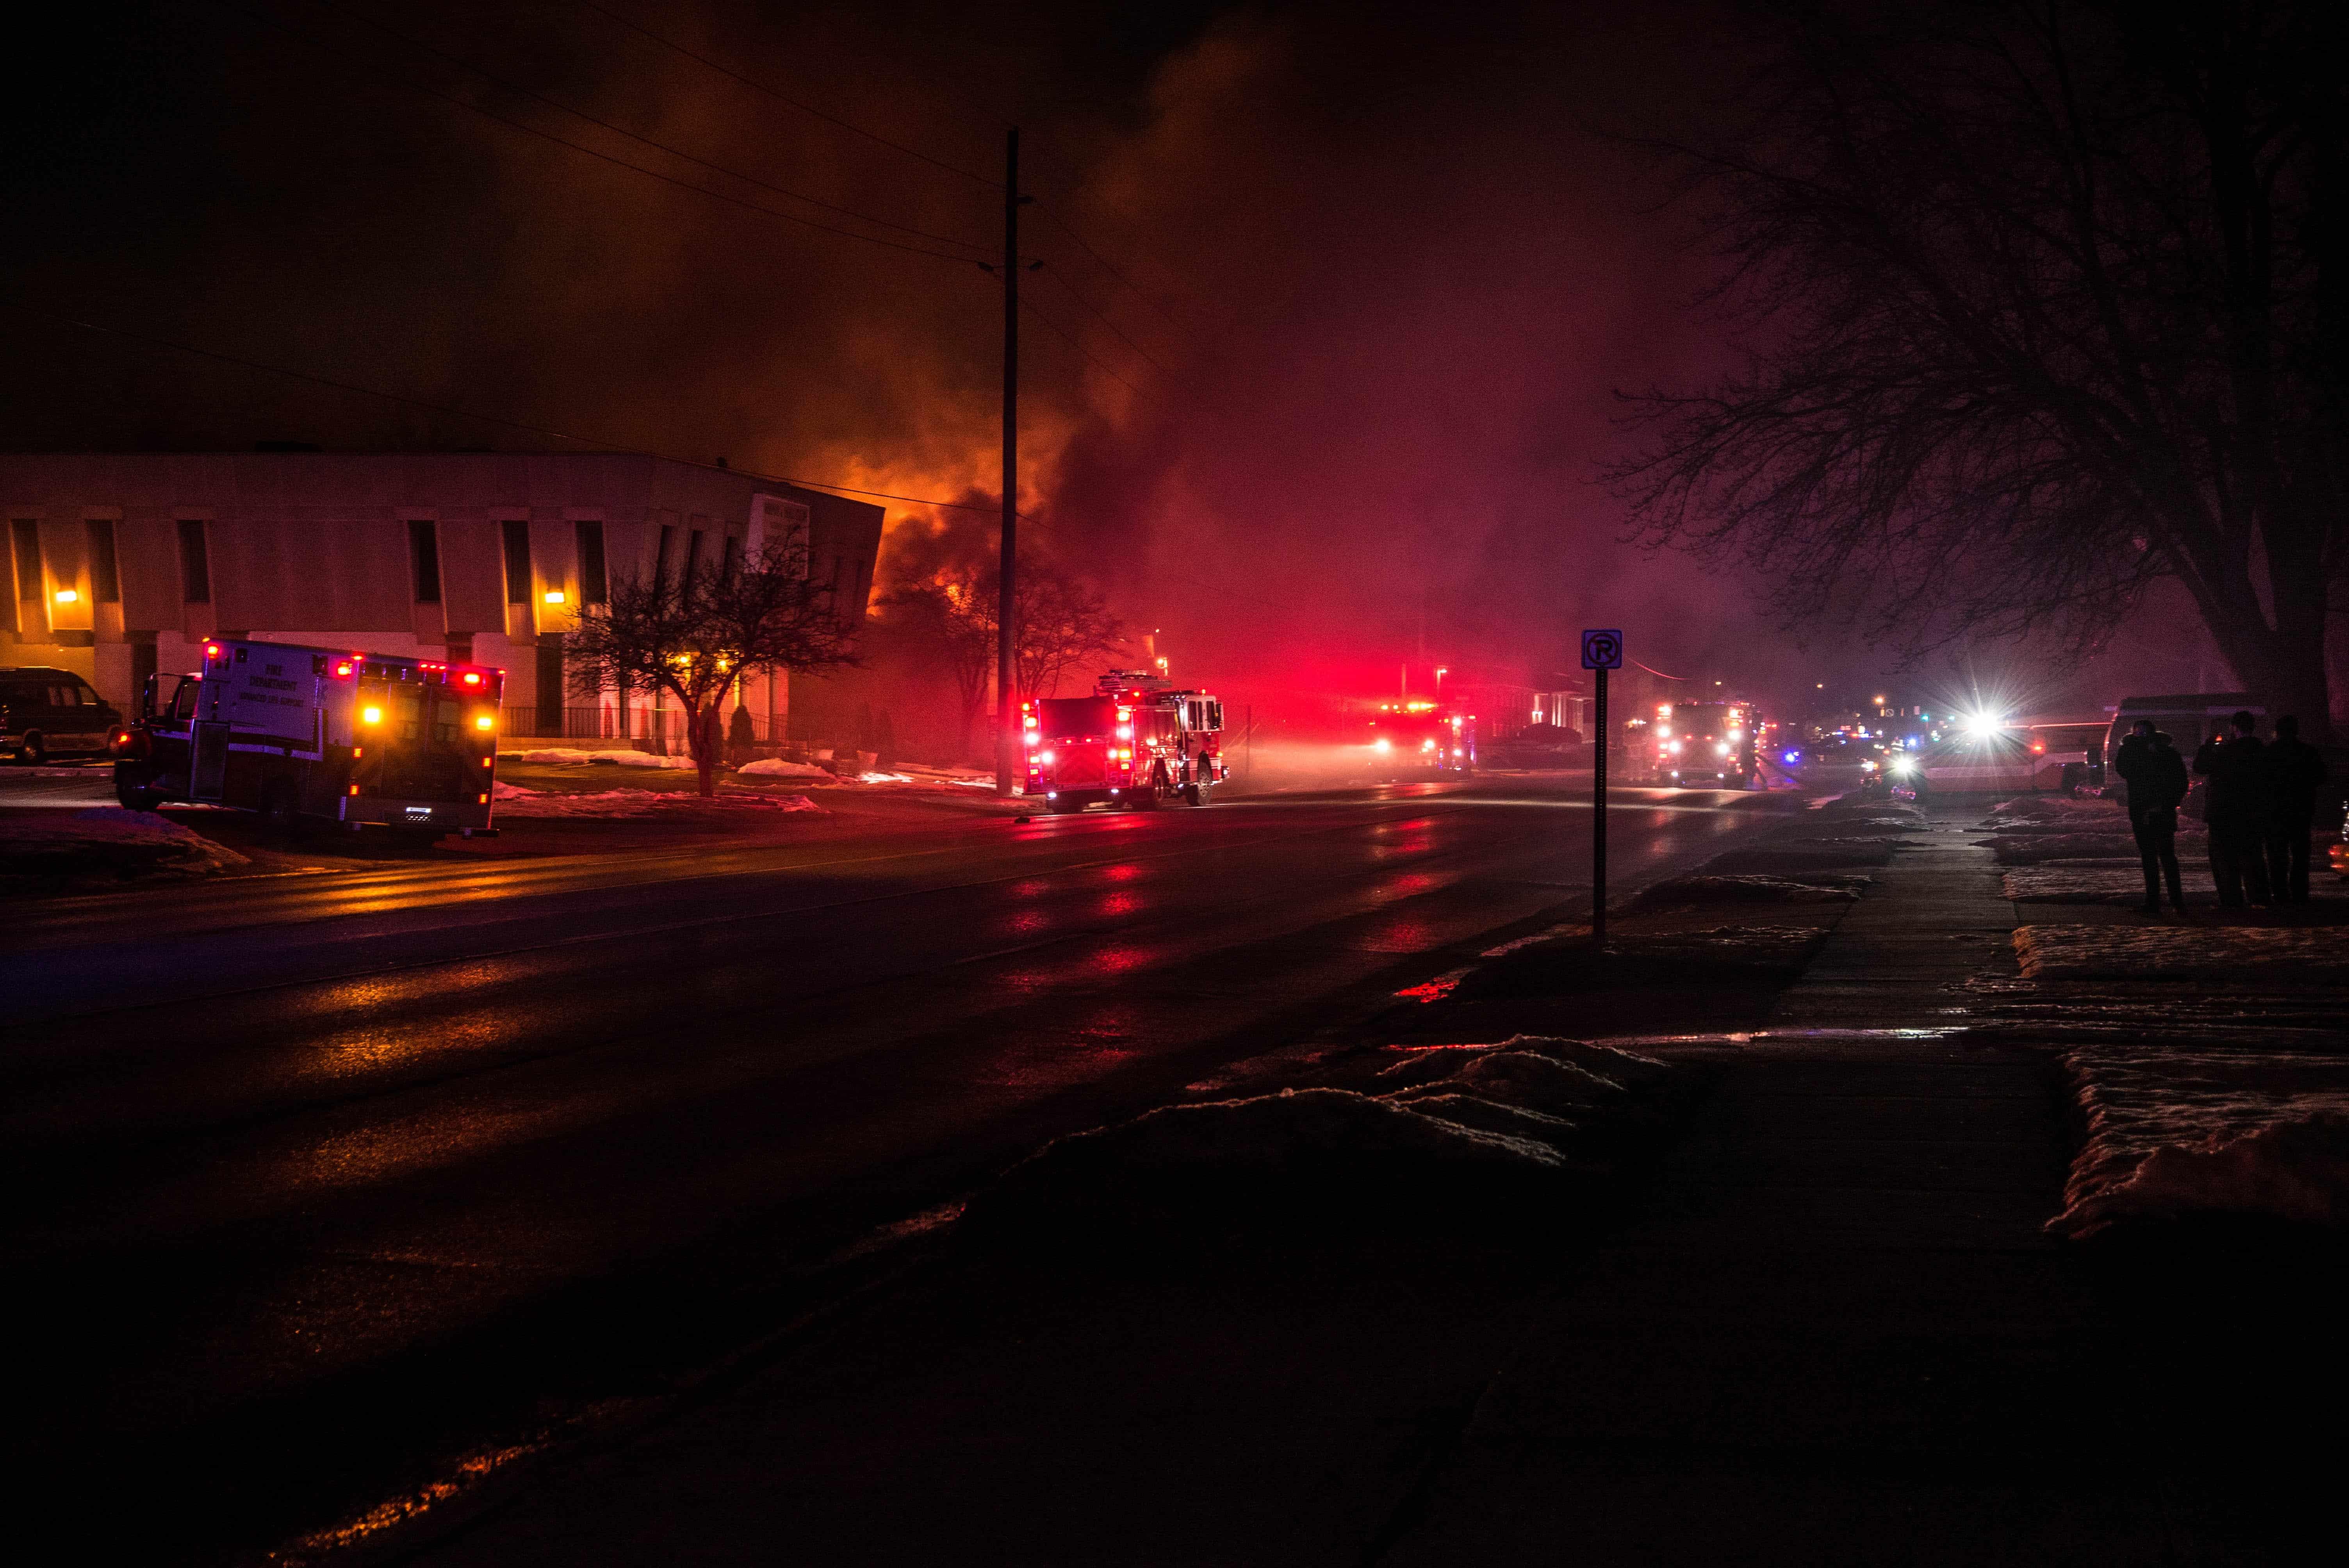 Santa Anita Avenue Injures Passenger, Kills Cameron Blaine Fish [Temple City, CA]